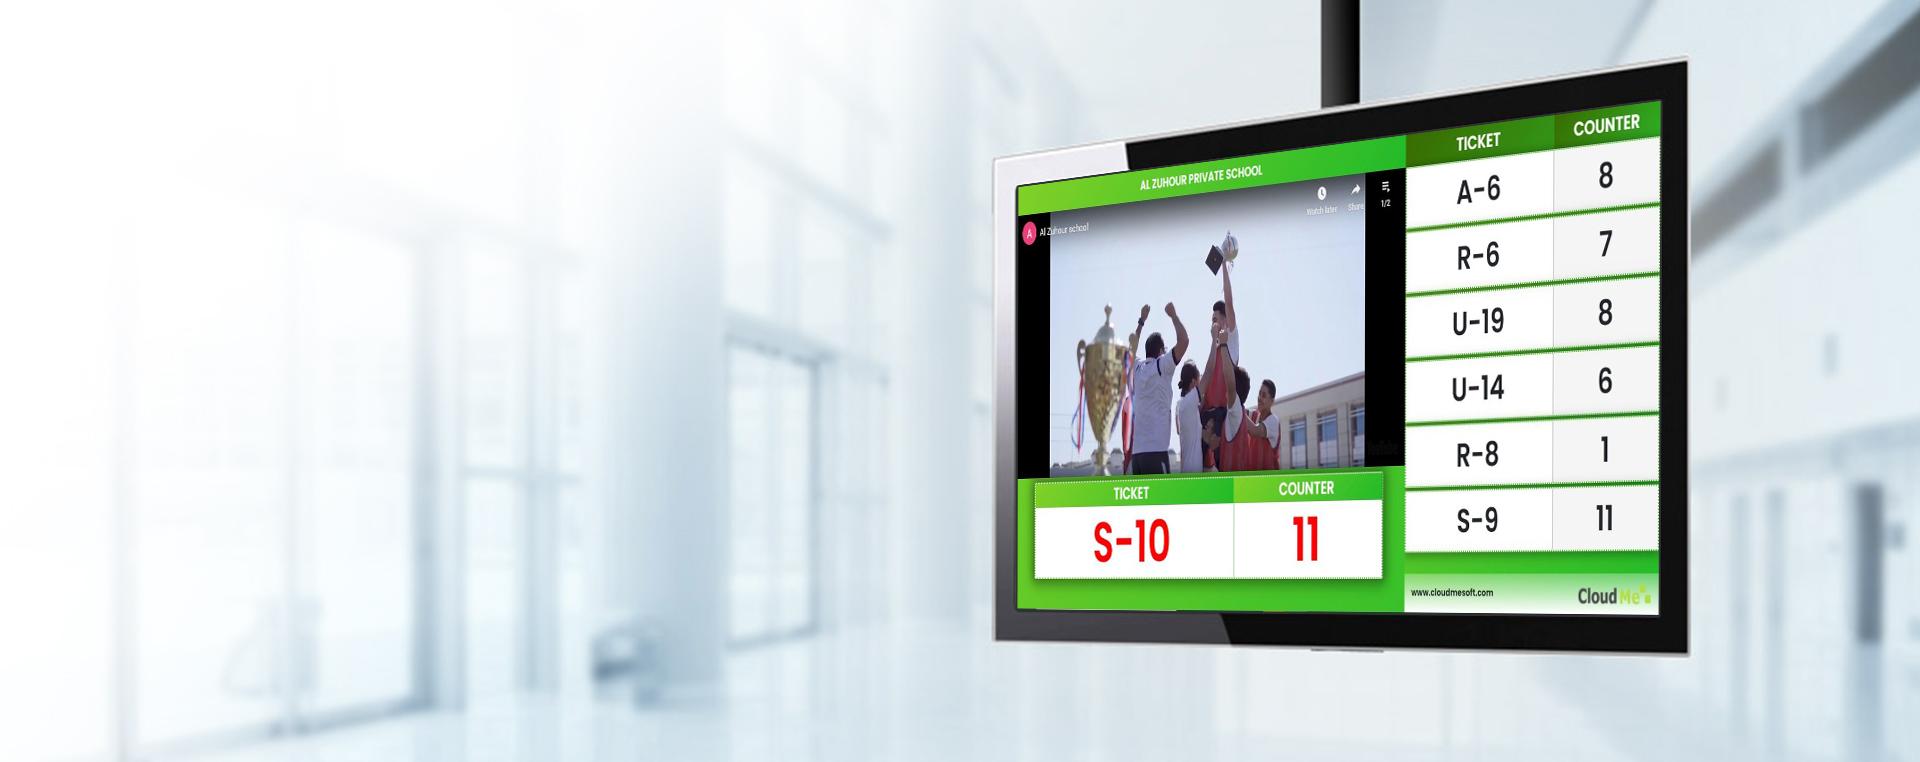 Queue Management System Software